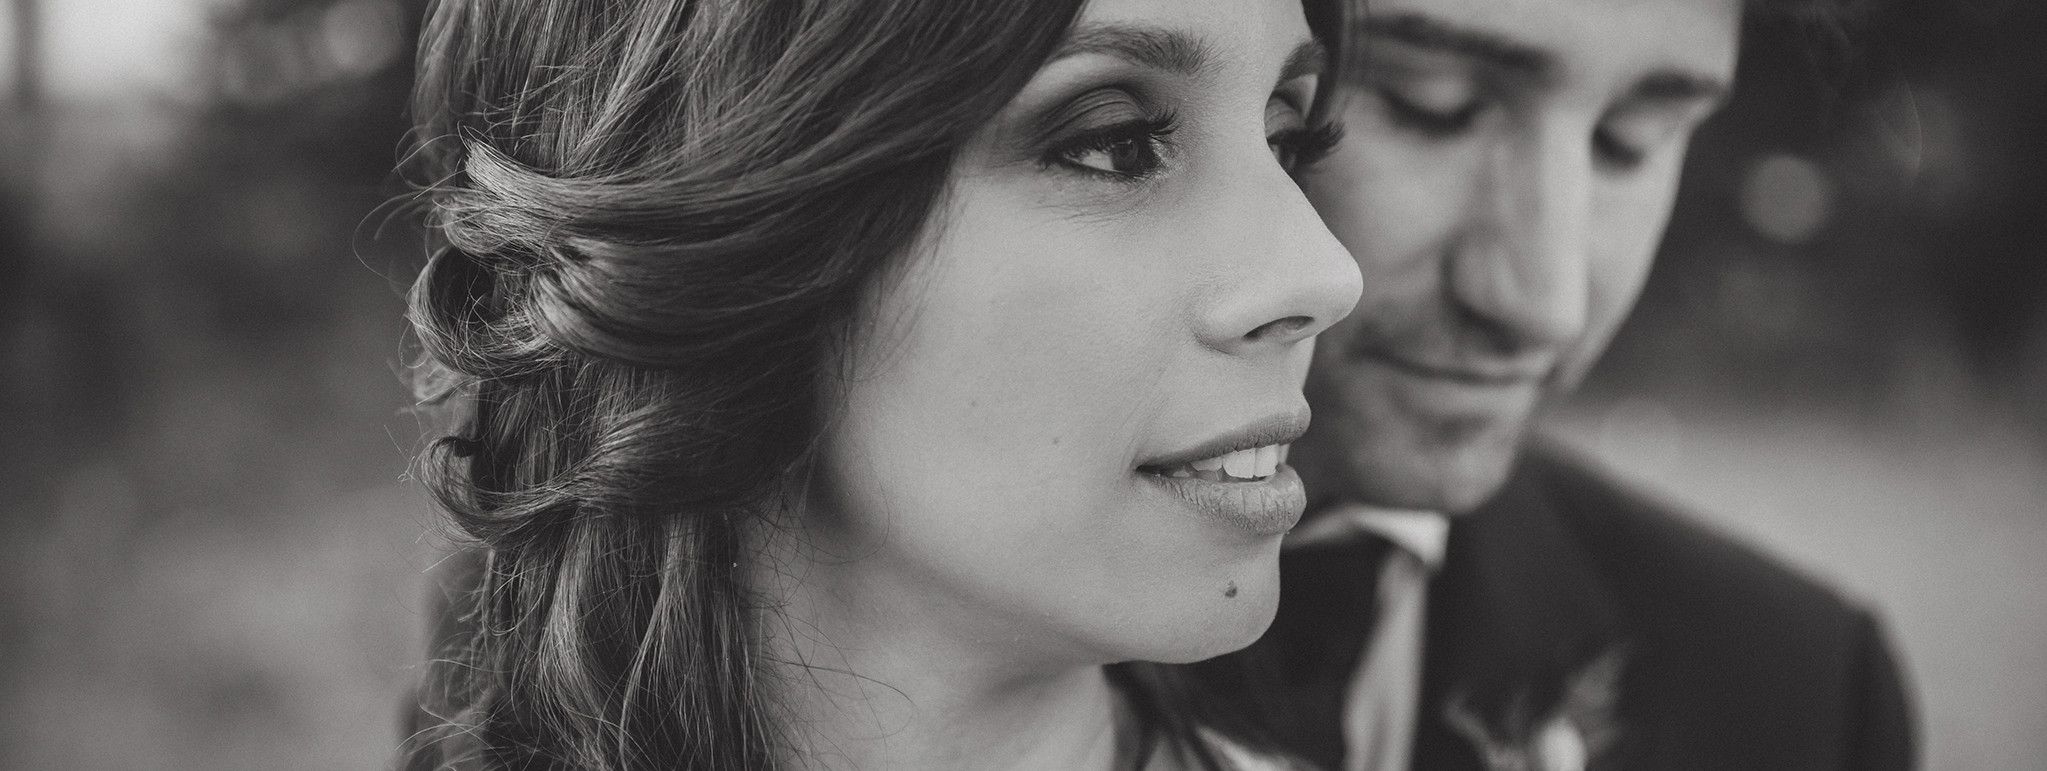 Fotografo bodas badajoz merida sevilla caceres Estrella Diaz Photovisual 34